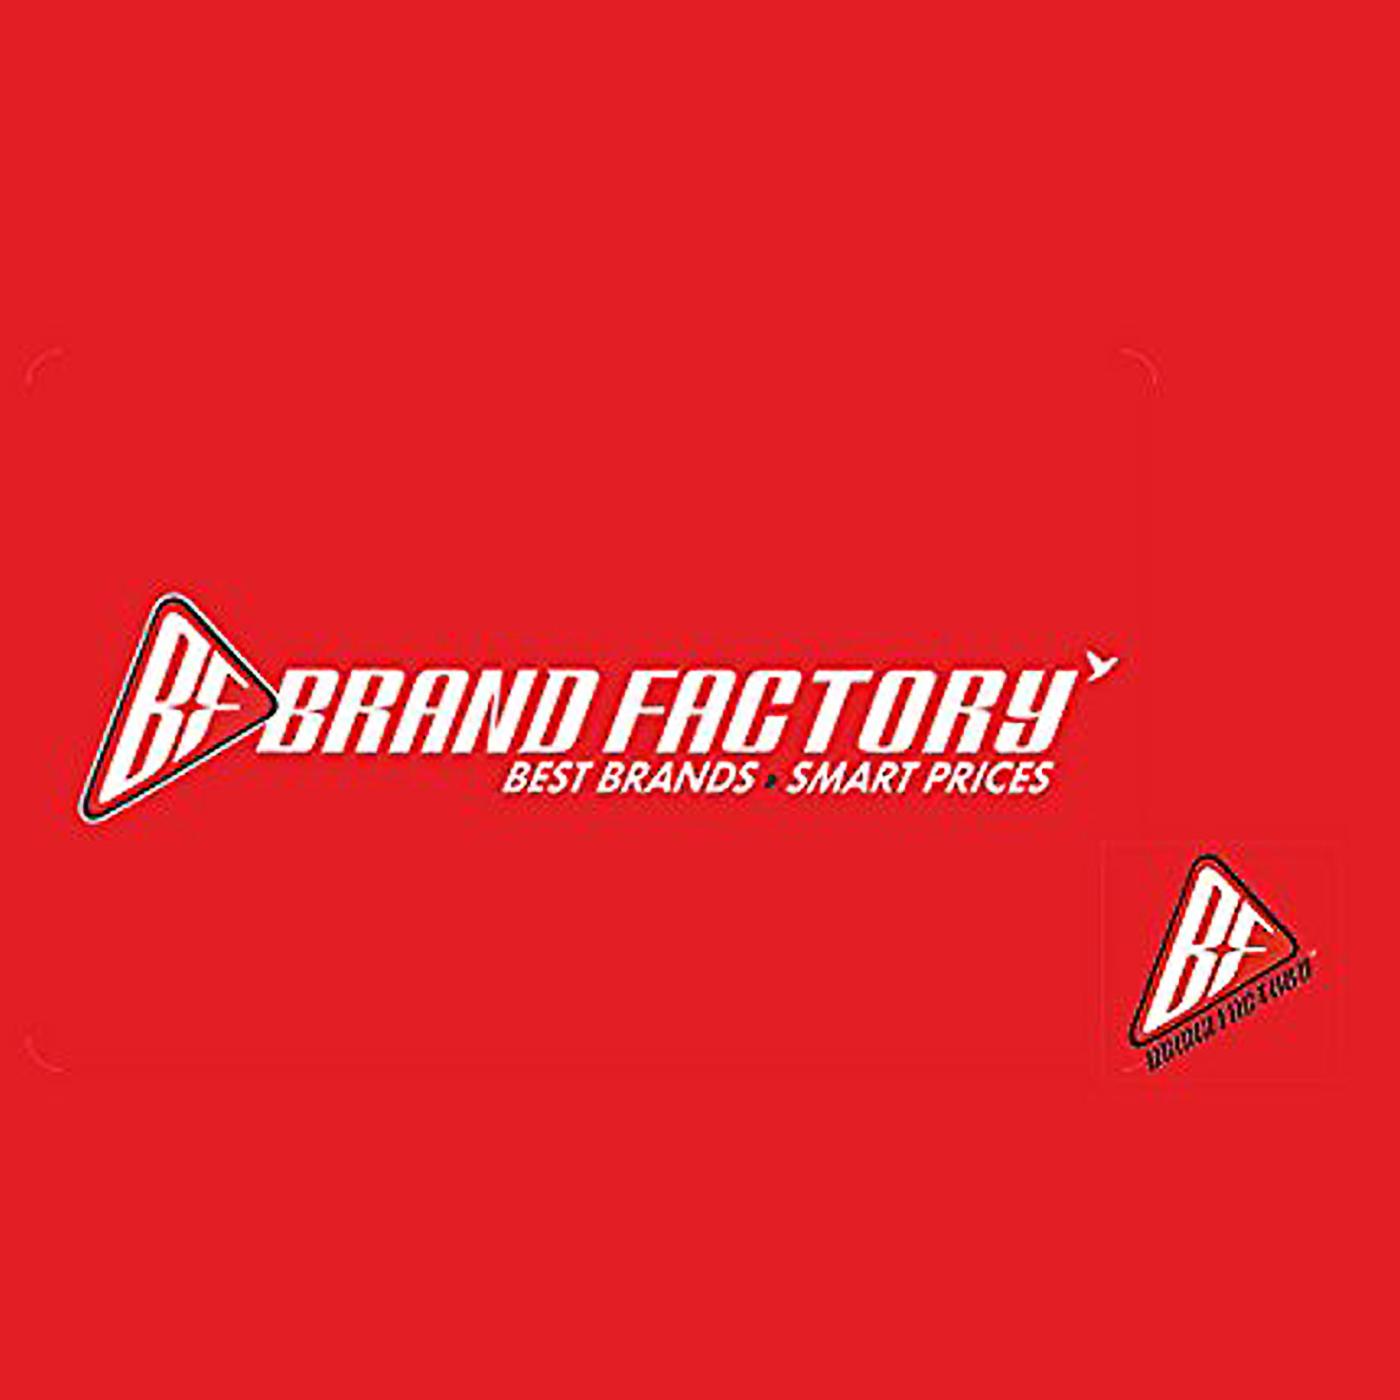 Brand Factory E-Gift Card